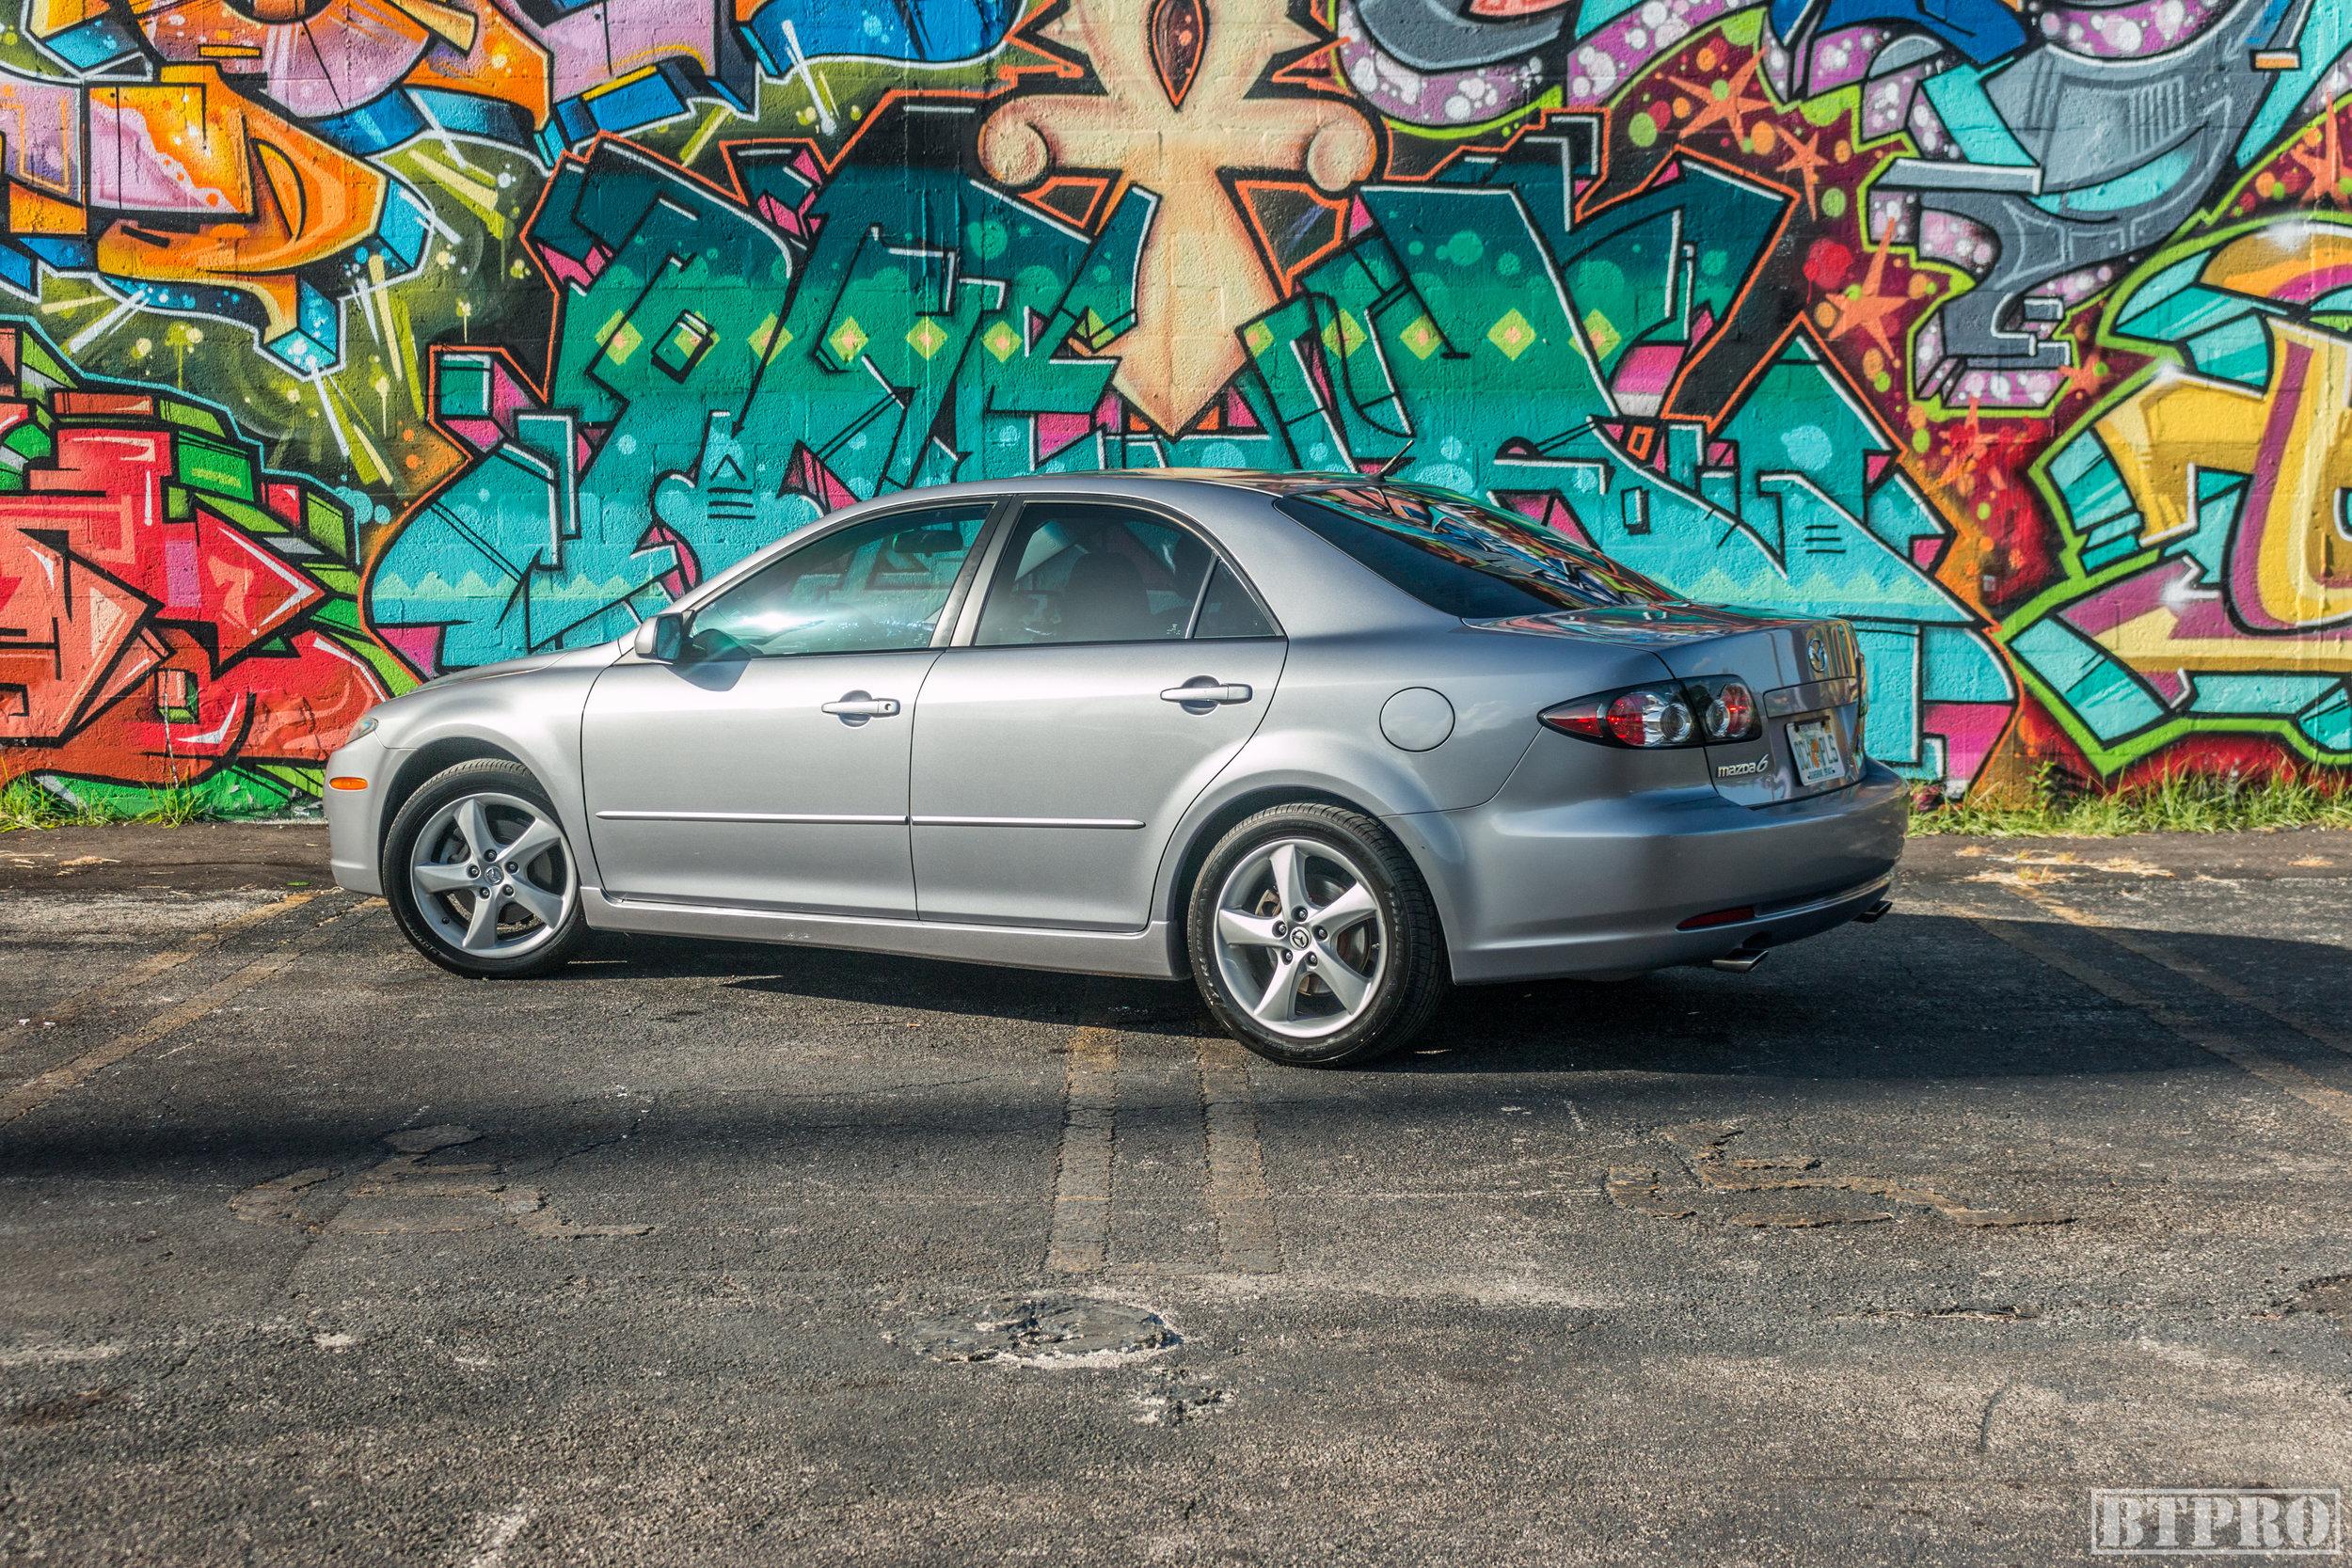 cars, car, mazda, mazda 6, car photography, wynwood, miami, commercial photography